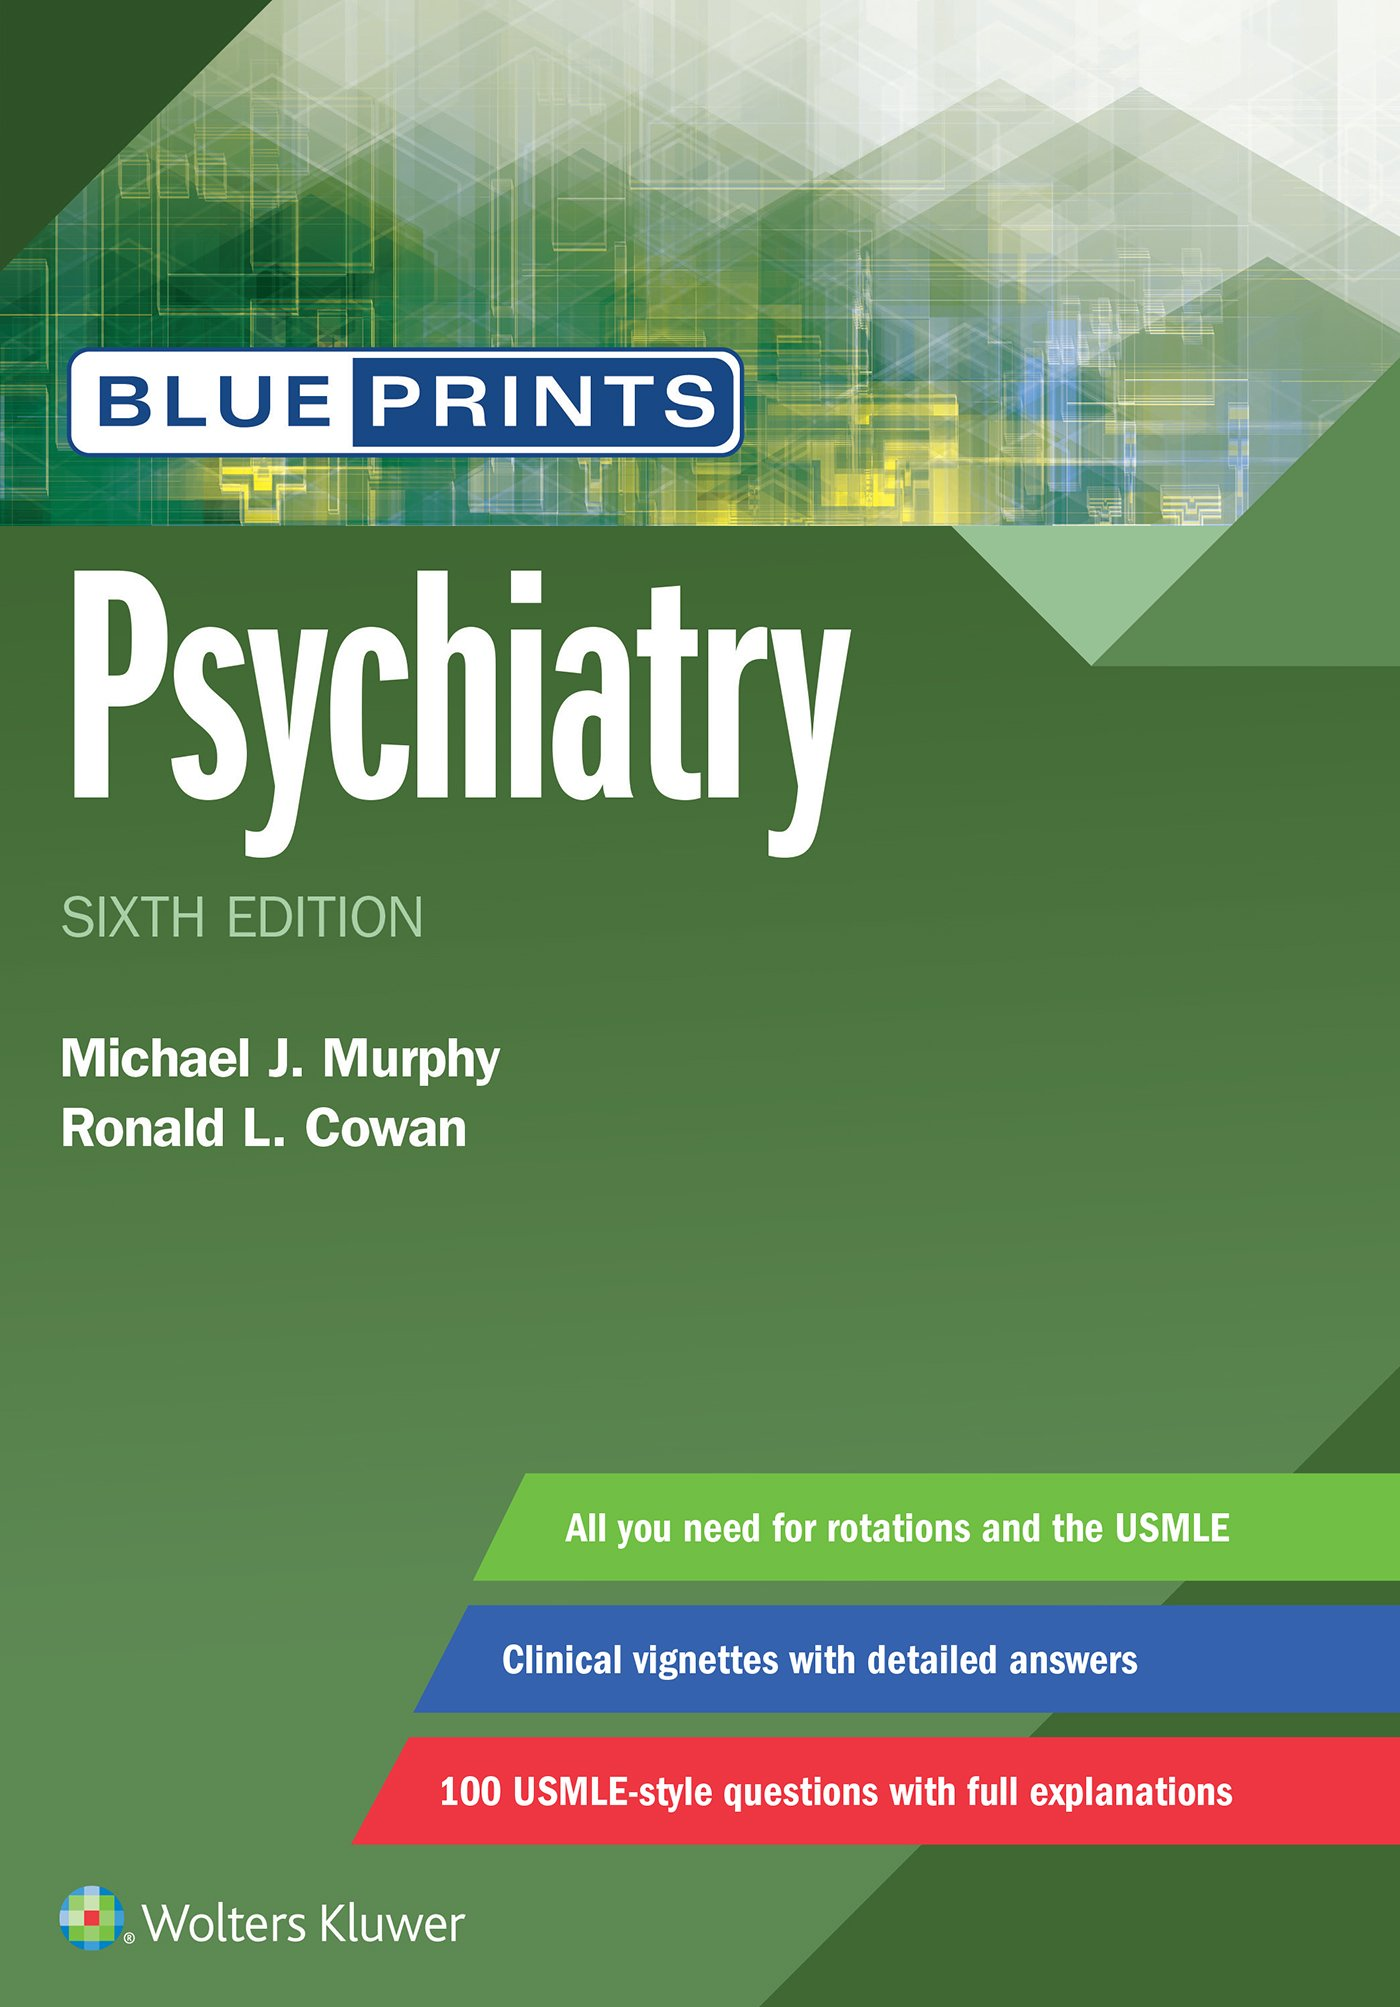 Blueprints Psychiatry Paperback – Aug 16 2018